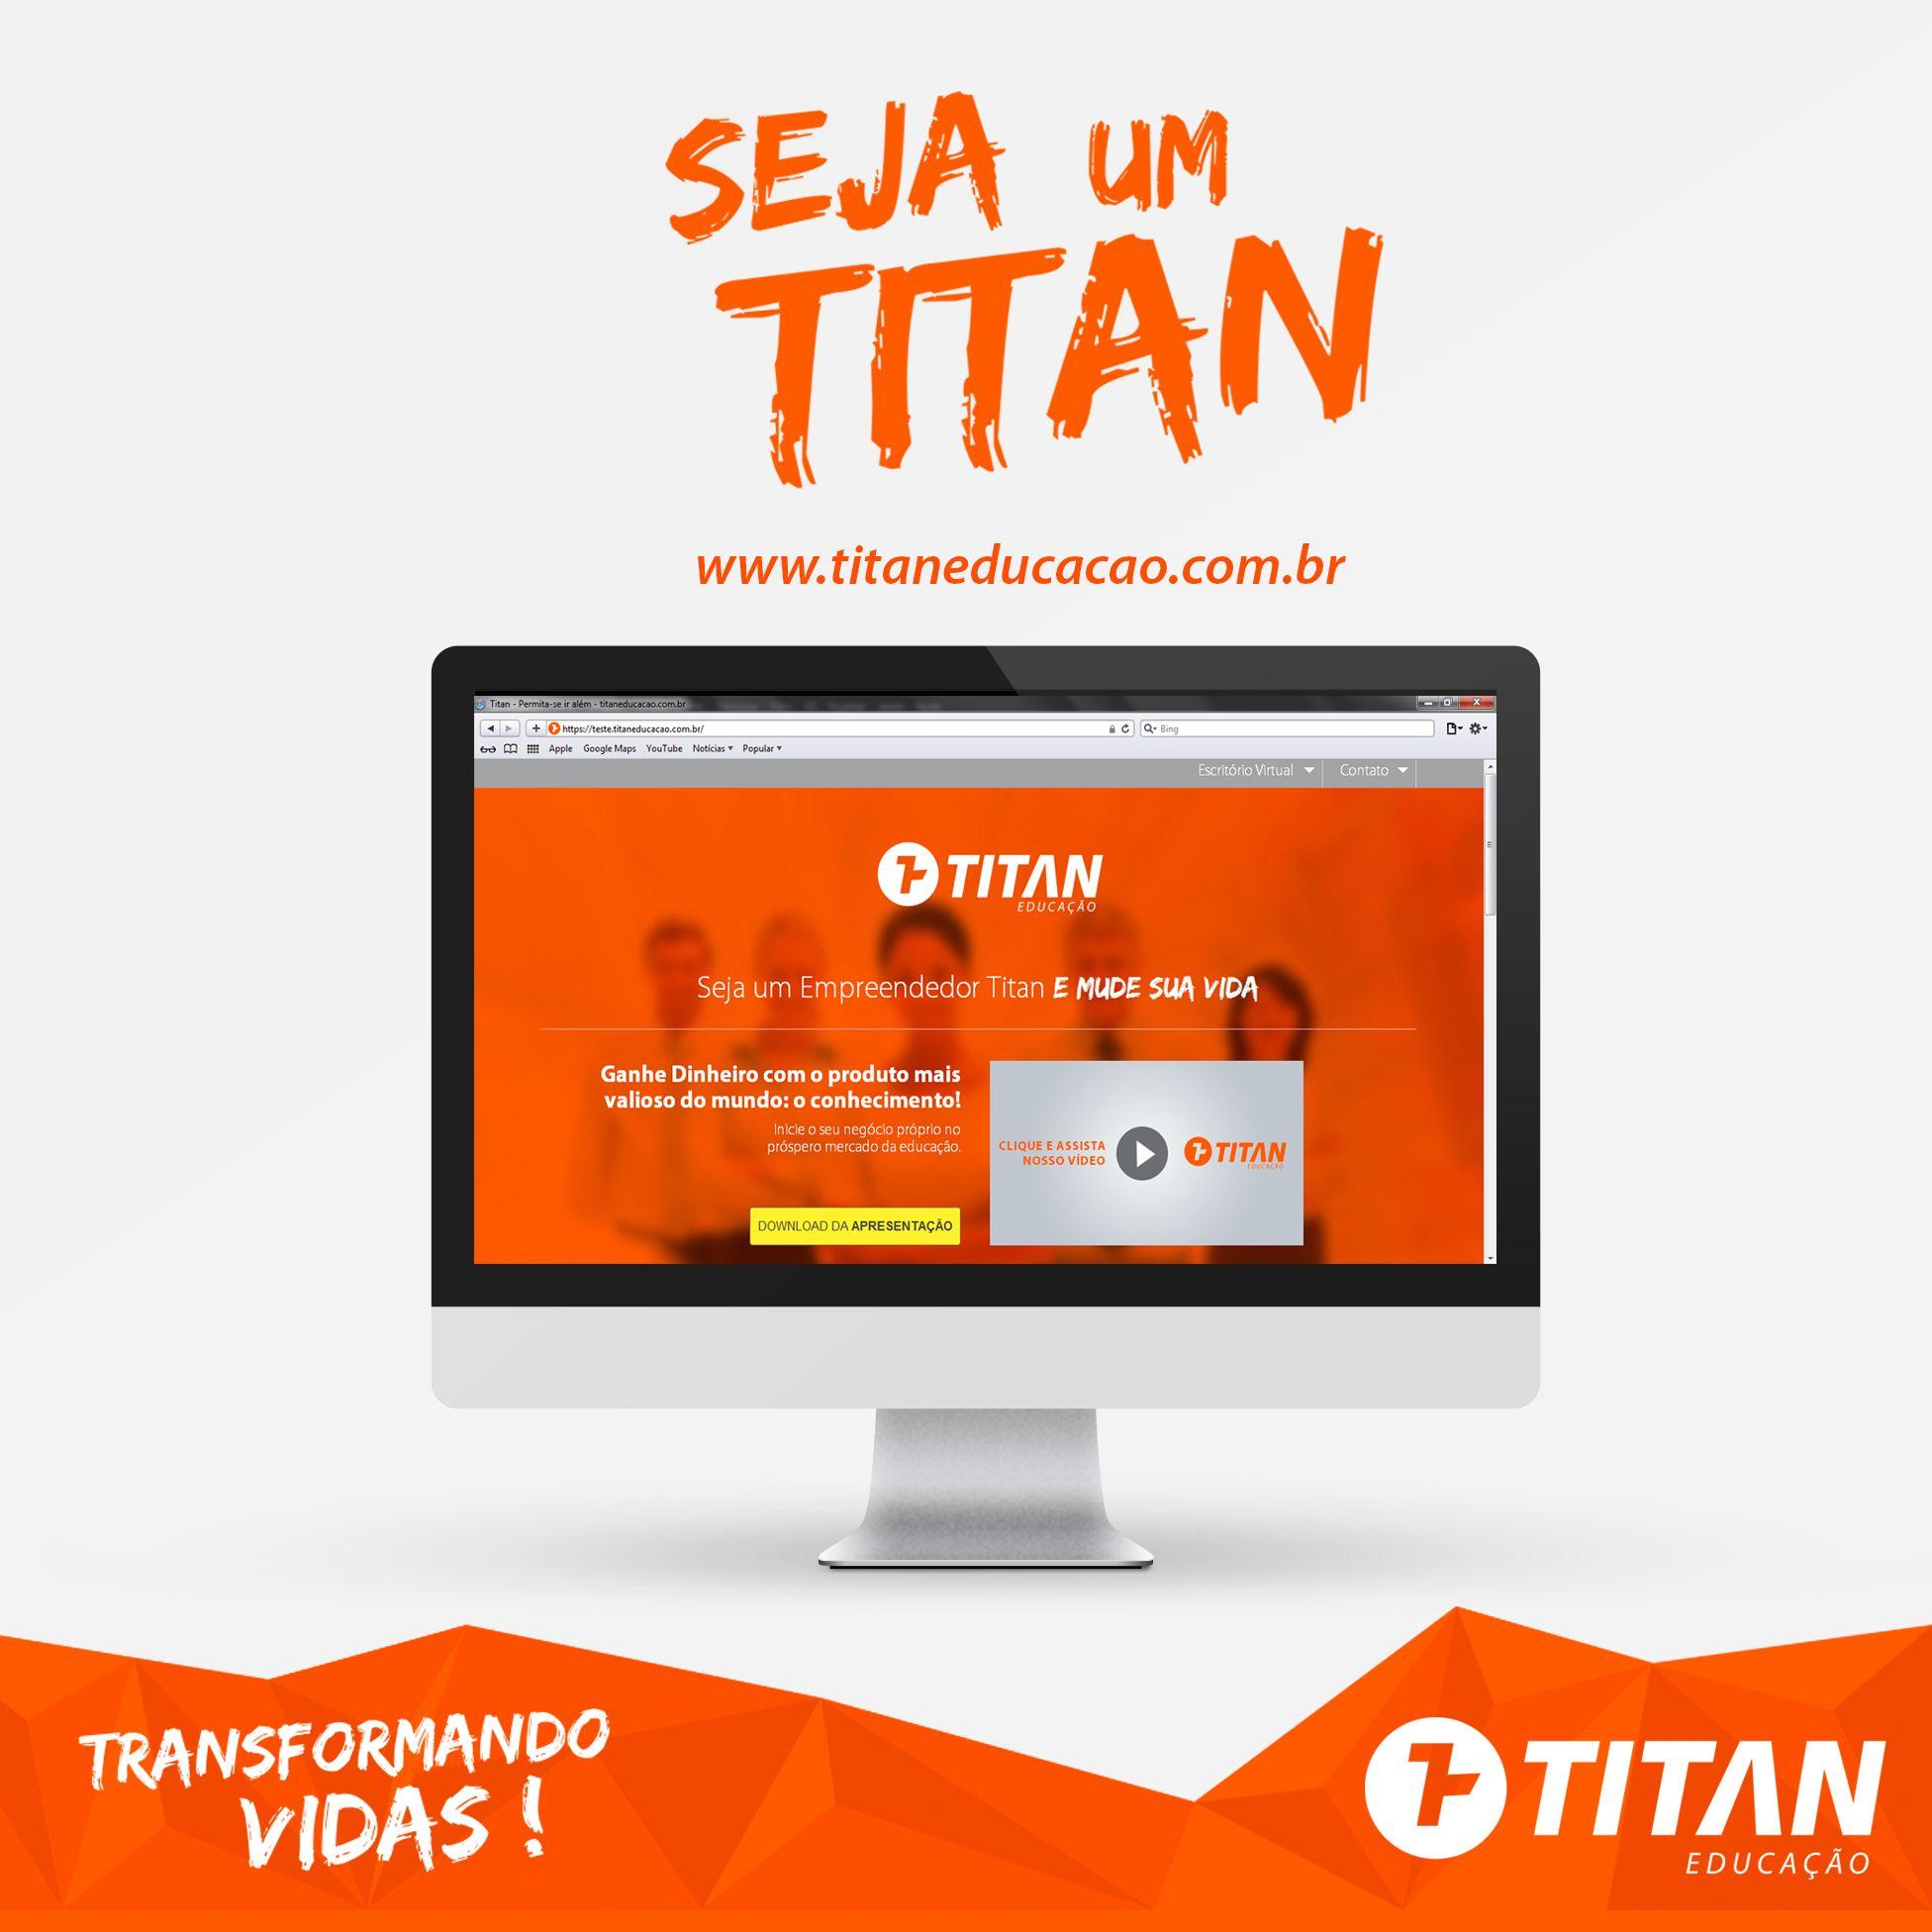 Seja um Titan